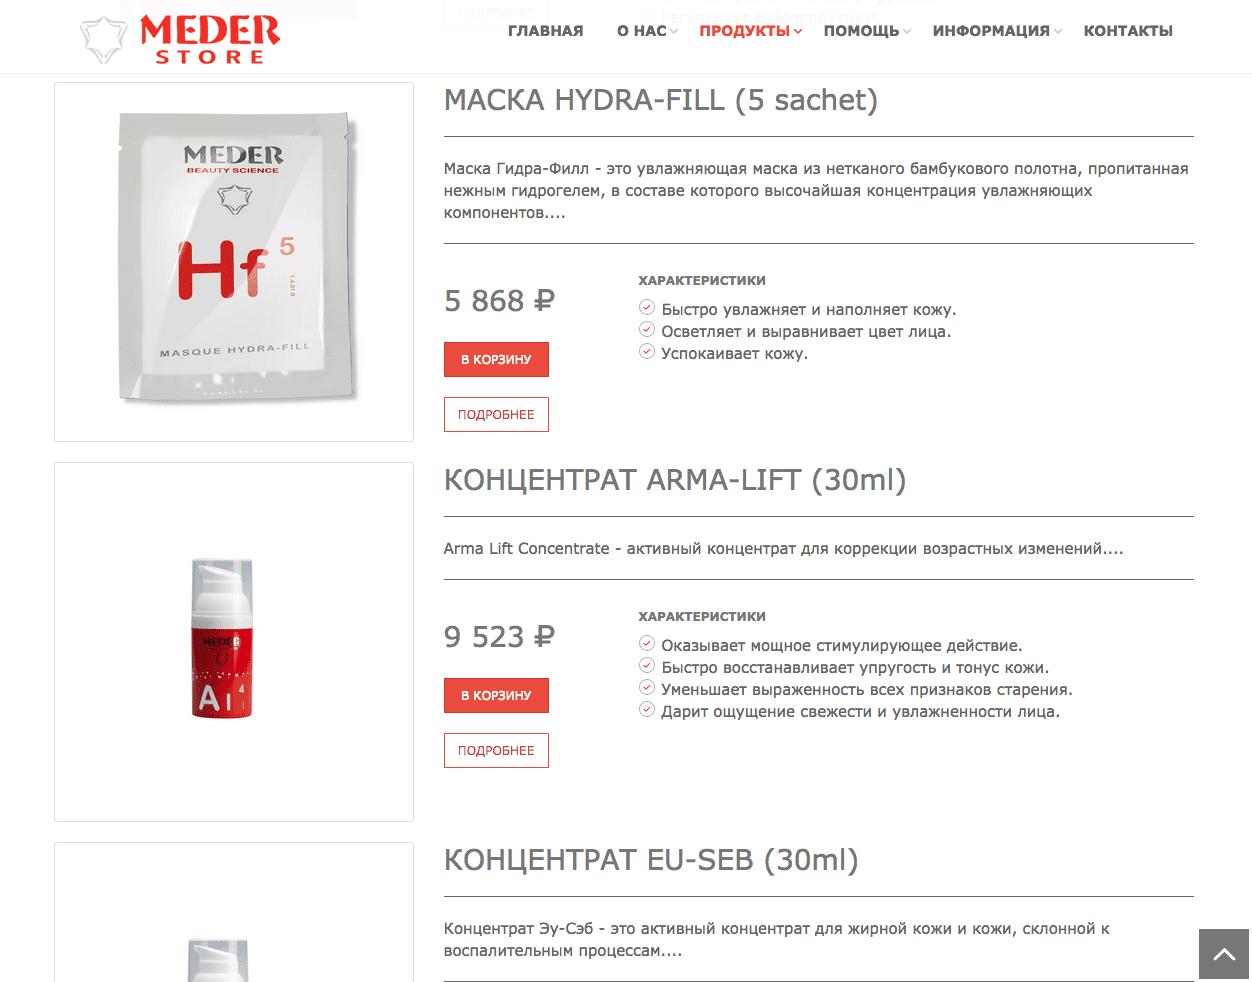 mederstore.ru - интернет-магазин косметической линии Meder Beauty Science